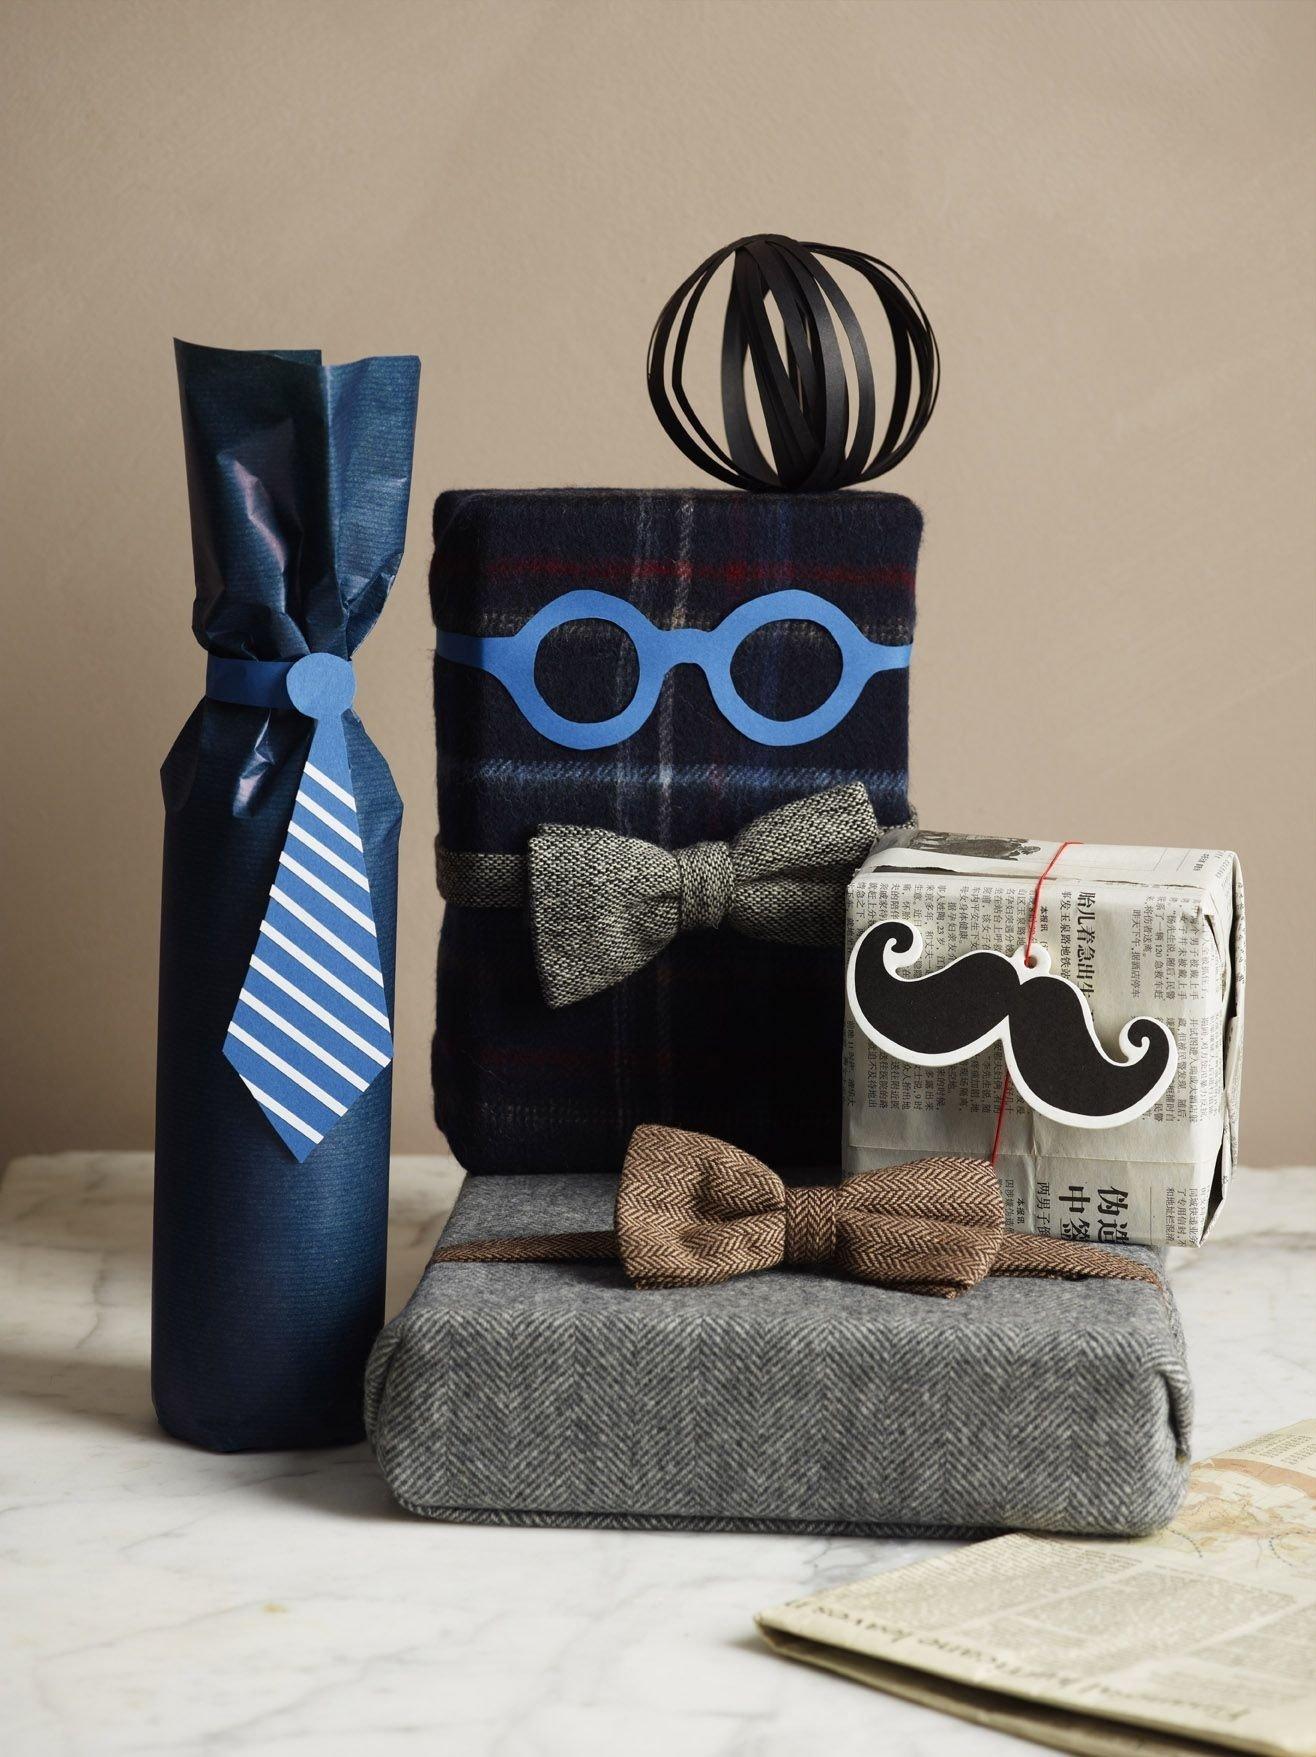 10 Stylish Gift Wrapping Ideas For Him envoltorios originales para el dia del padre 2020